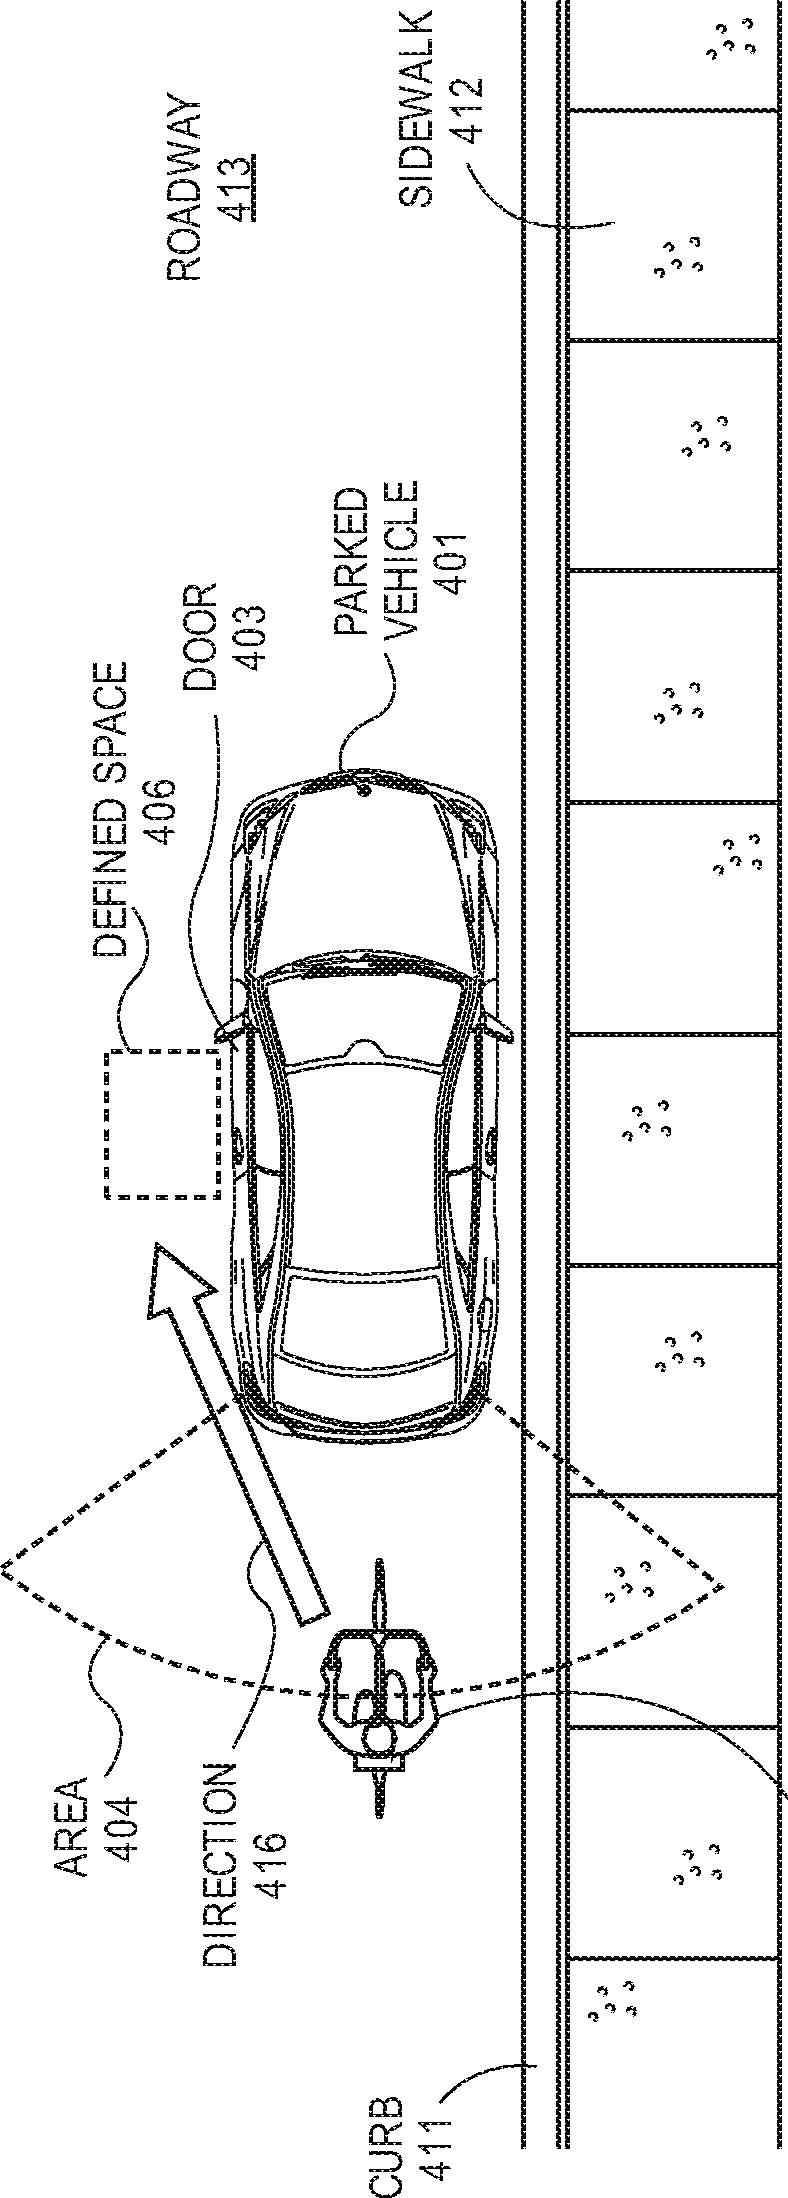 Figure GB2554123A_D0011